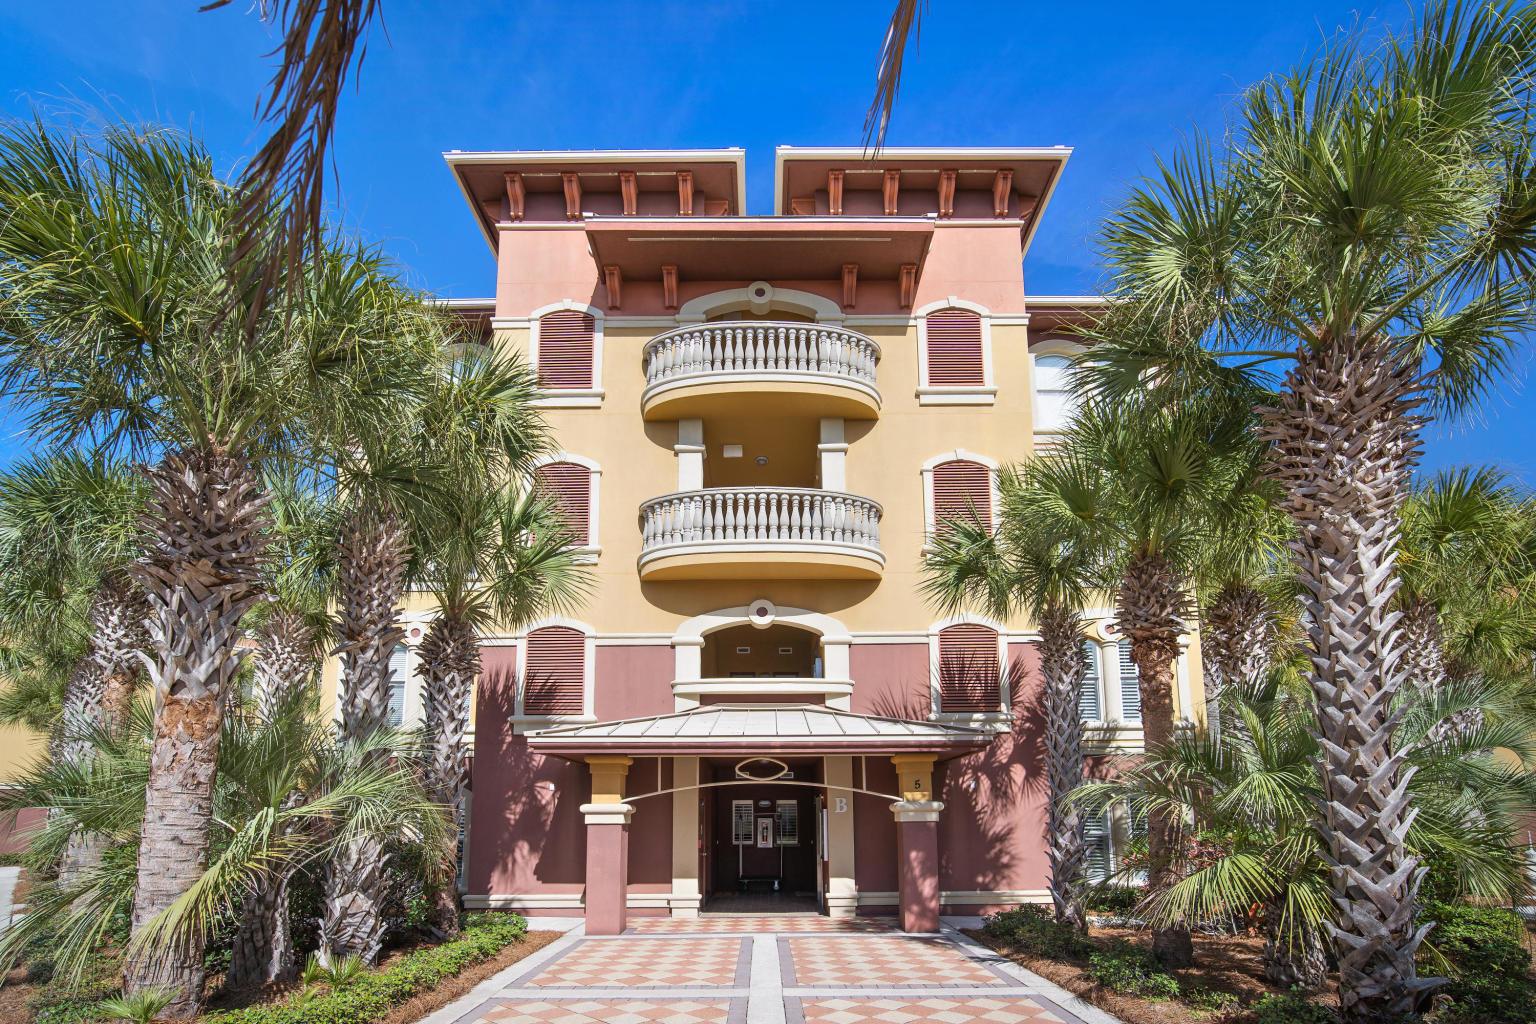 Photo of home for sale at 5 Seacrest, Seacrest FL